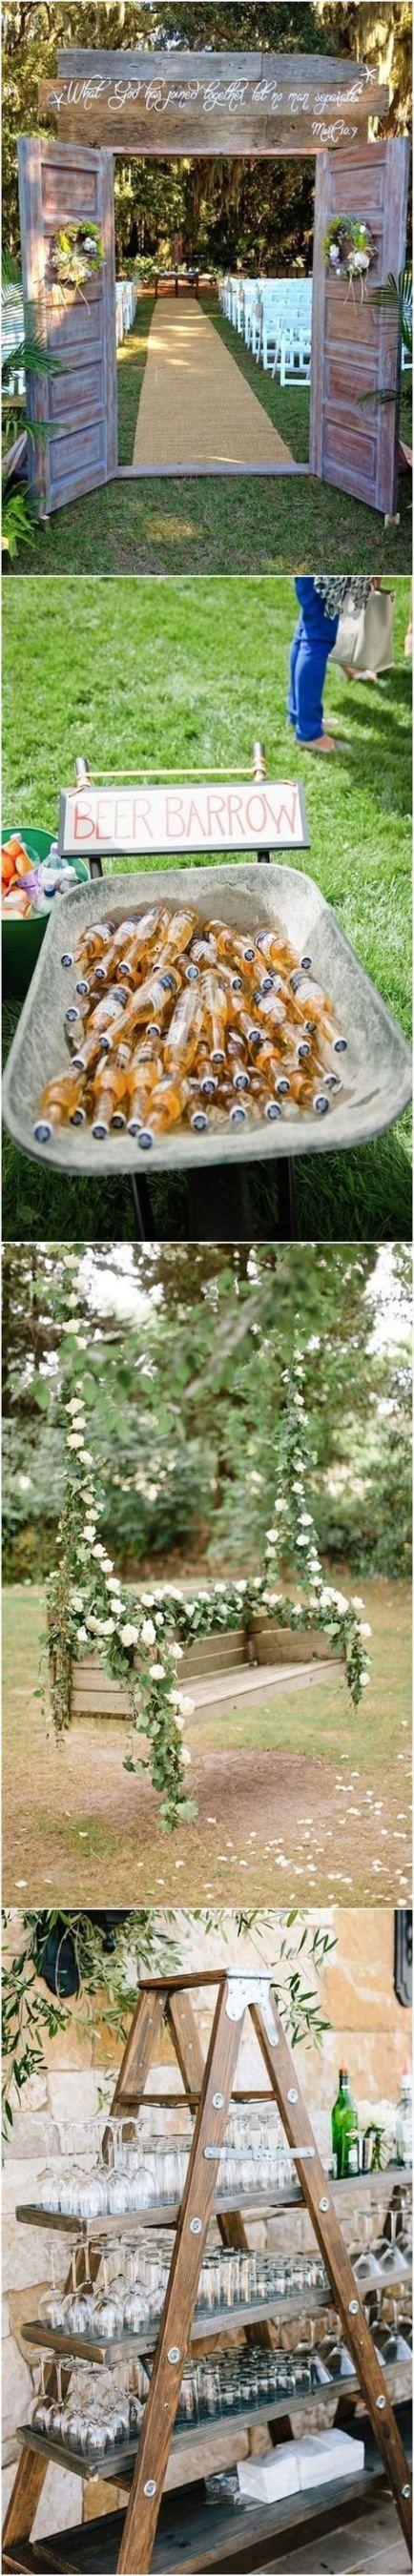 46+ ideas wedding ideas on a budget rustic tips | Rustic ...